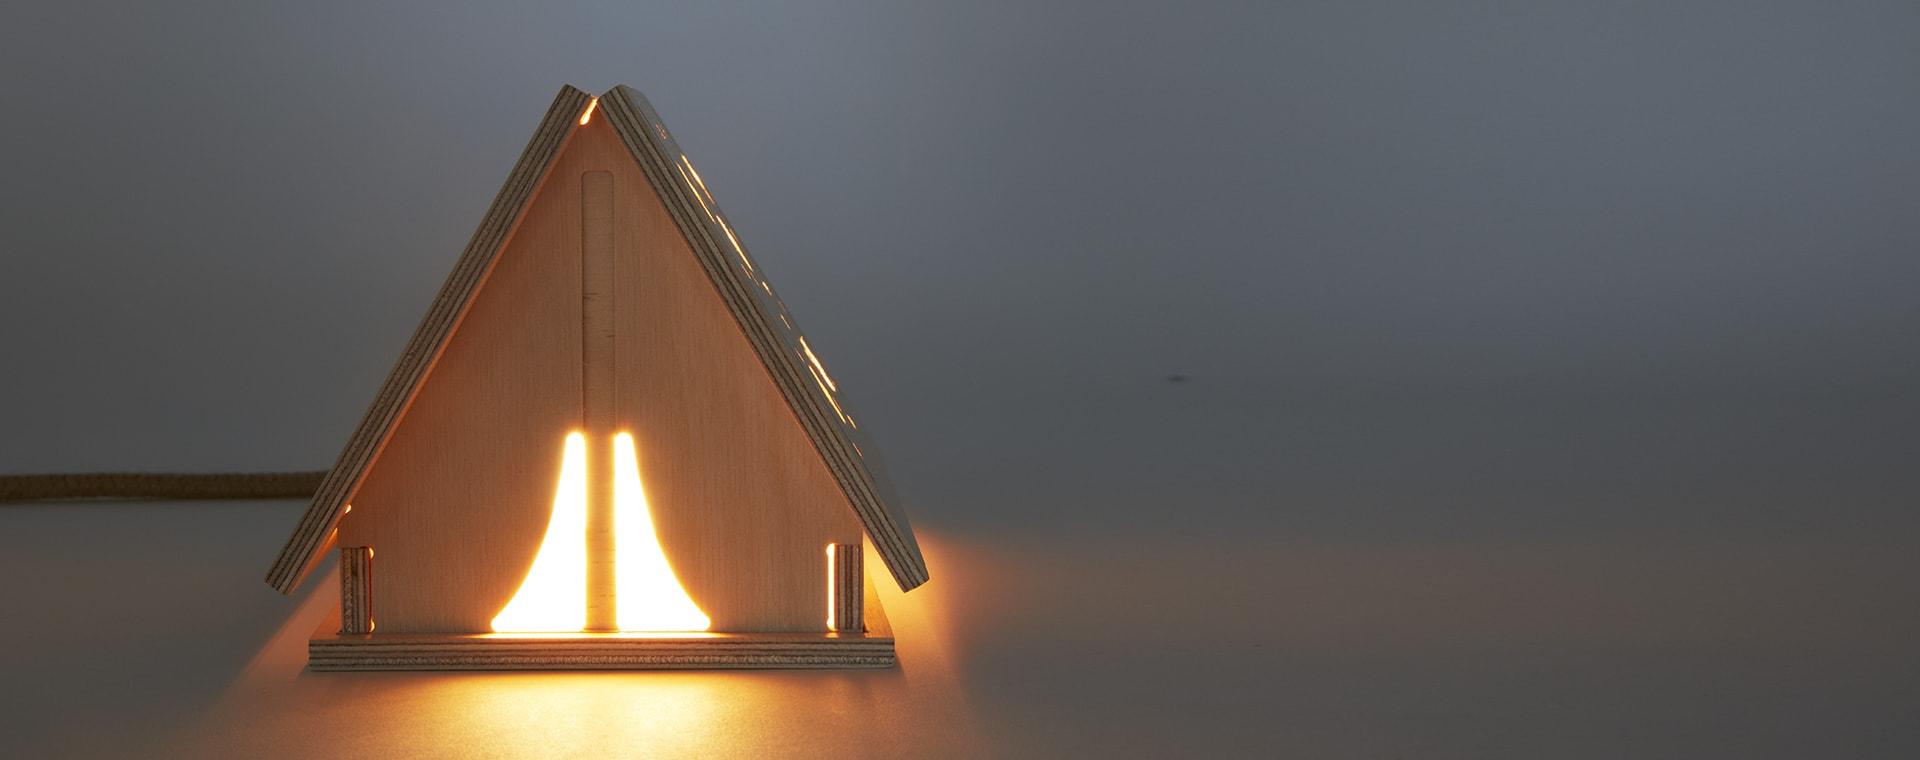 Neutral Bright Corner Star Tent Light